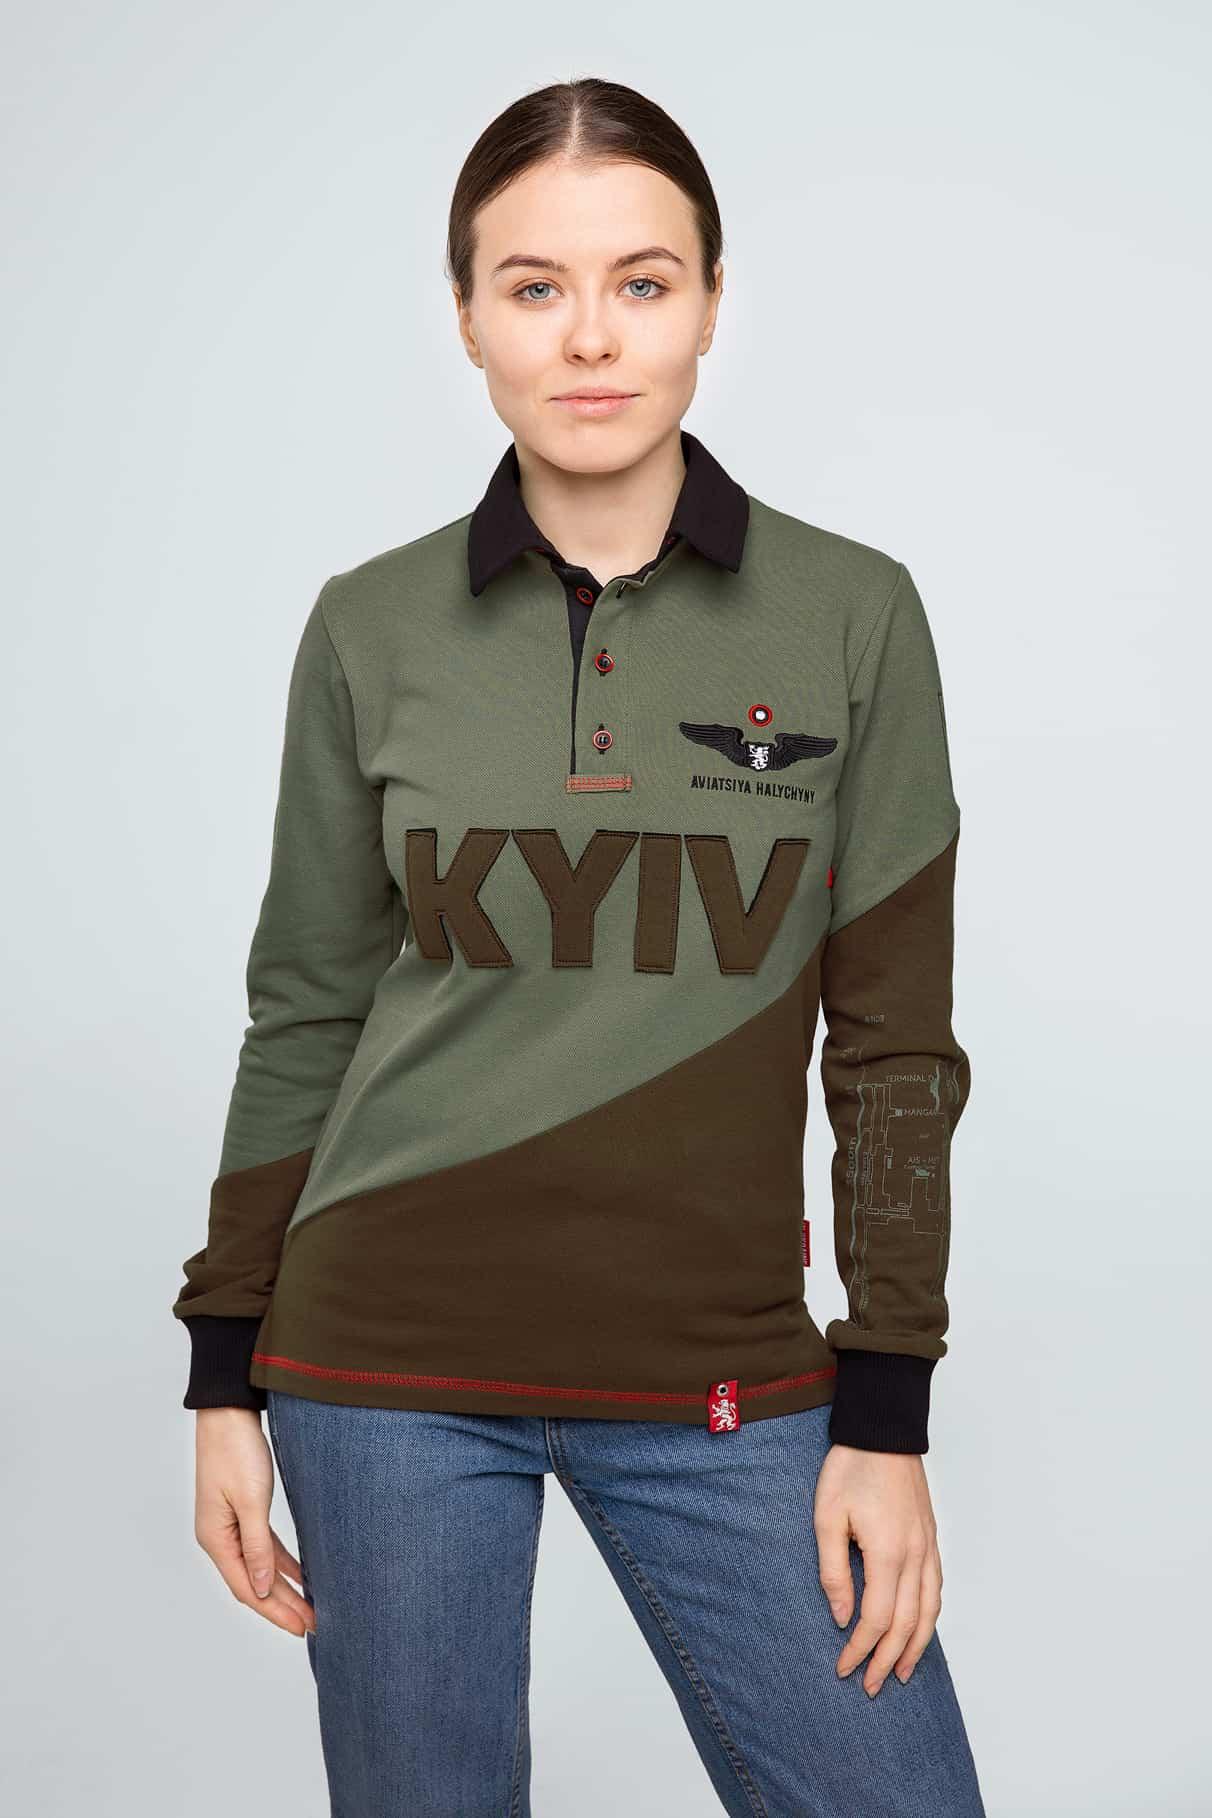 Women's Polo Long Kyiv. Color green. Unisex polo long (men's sizes).